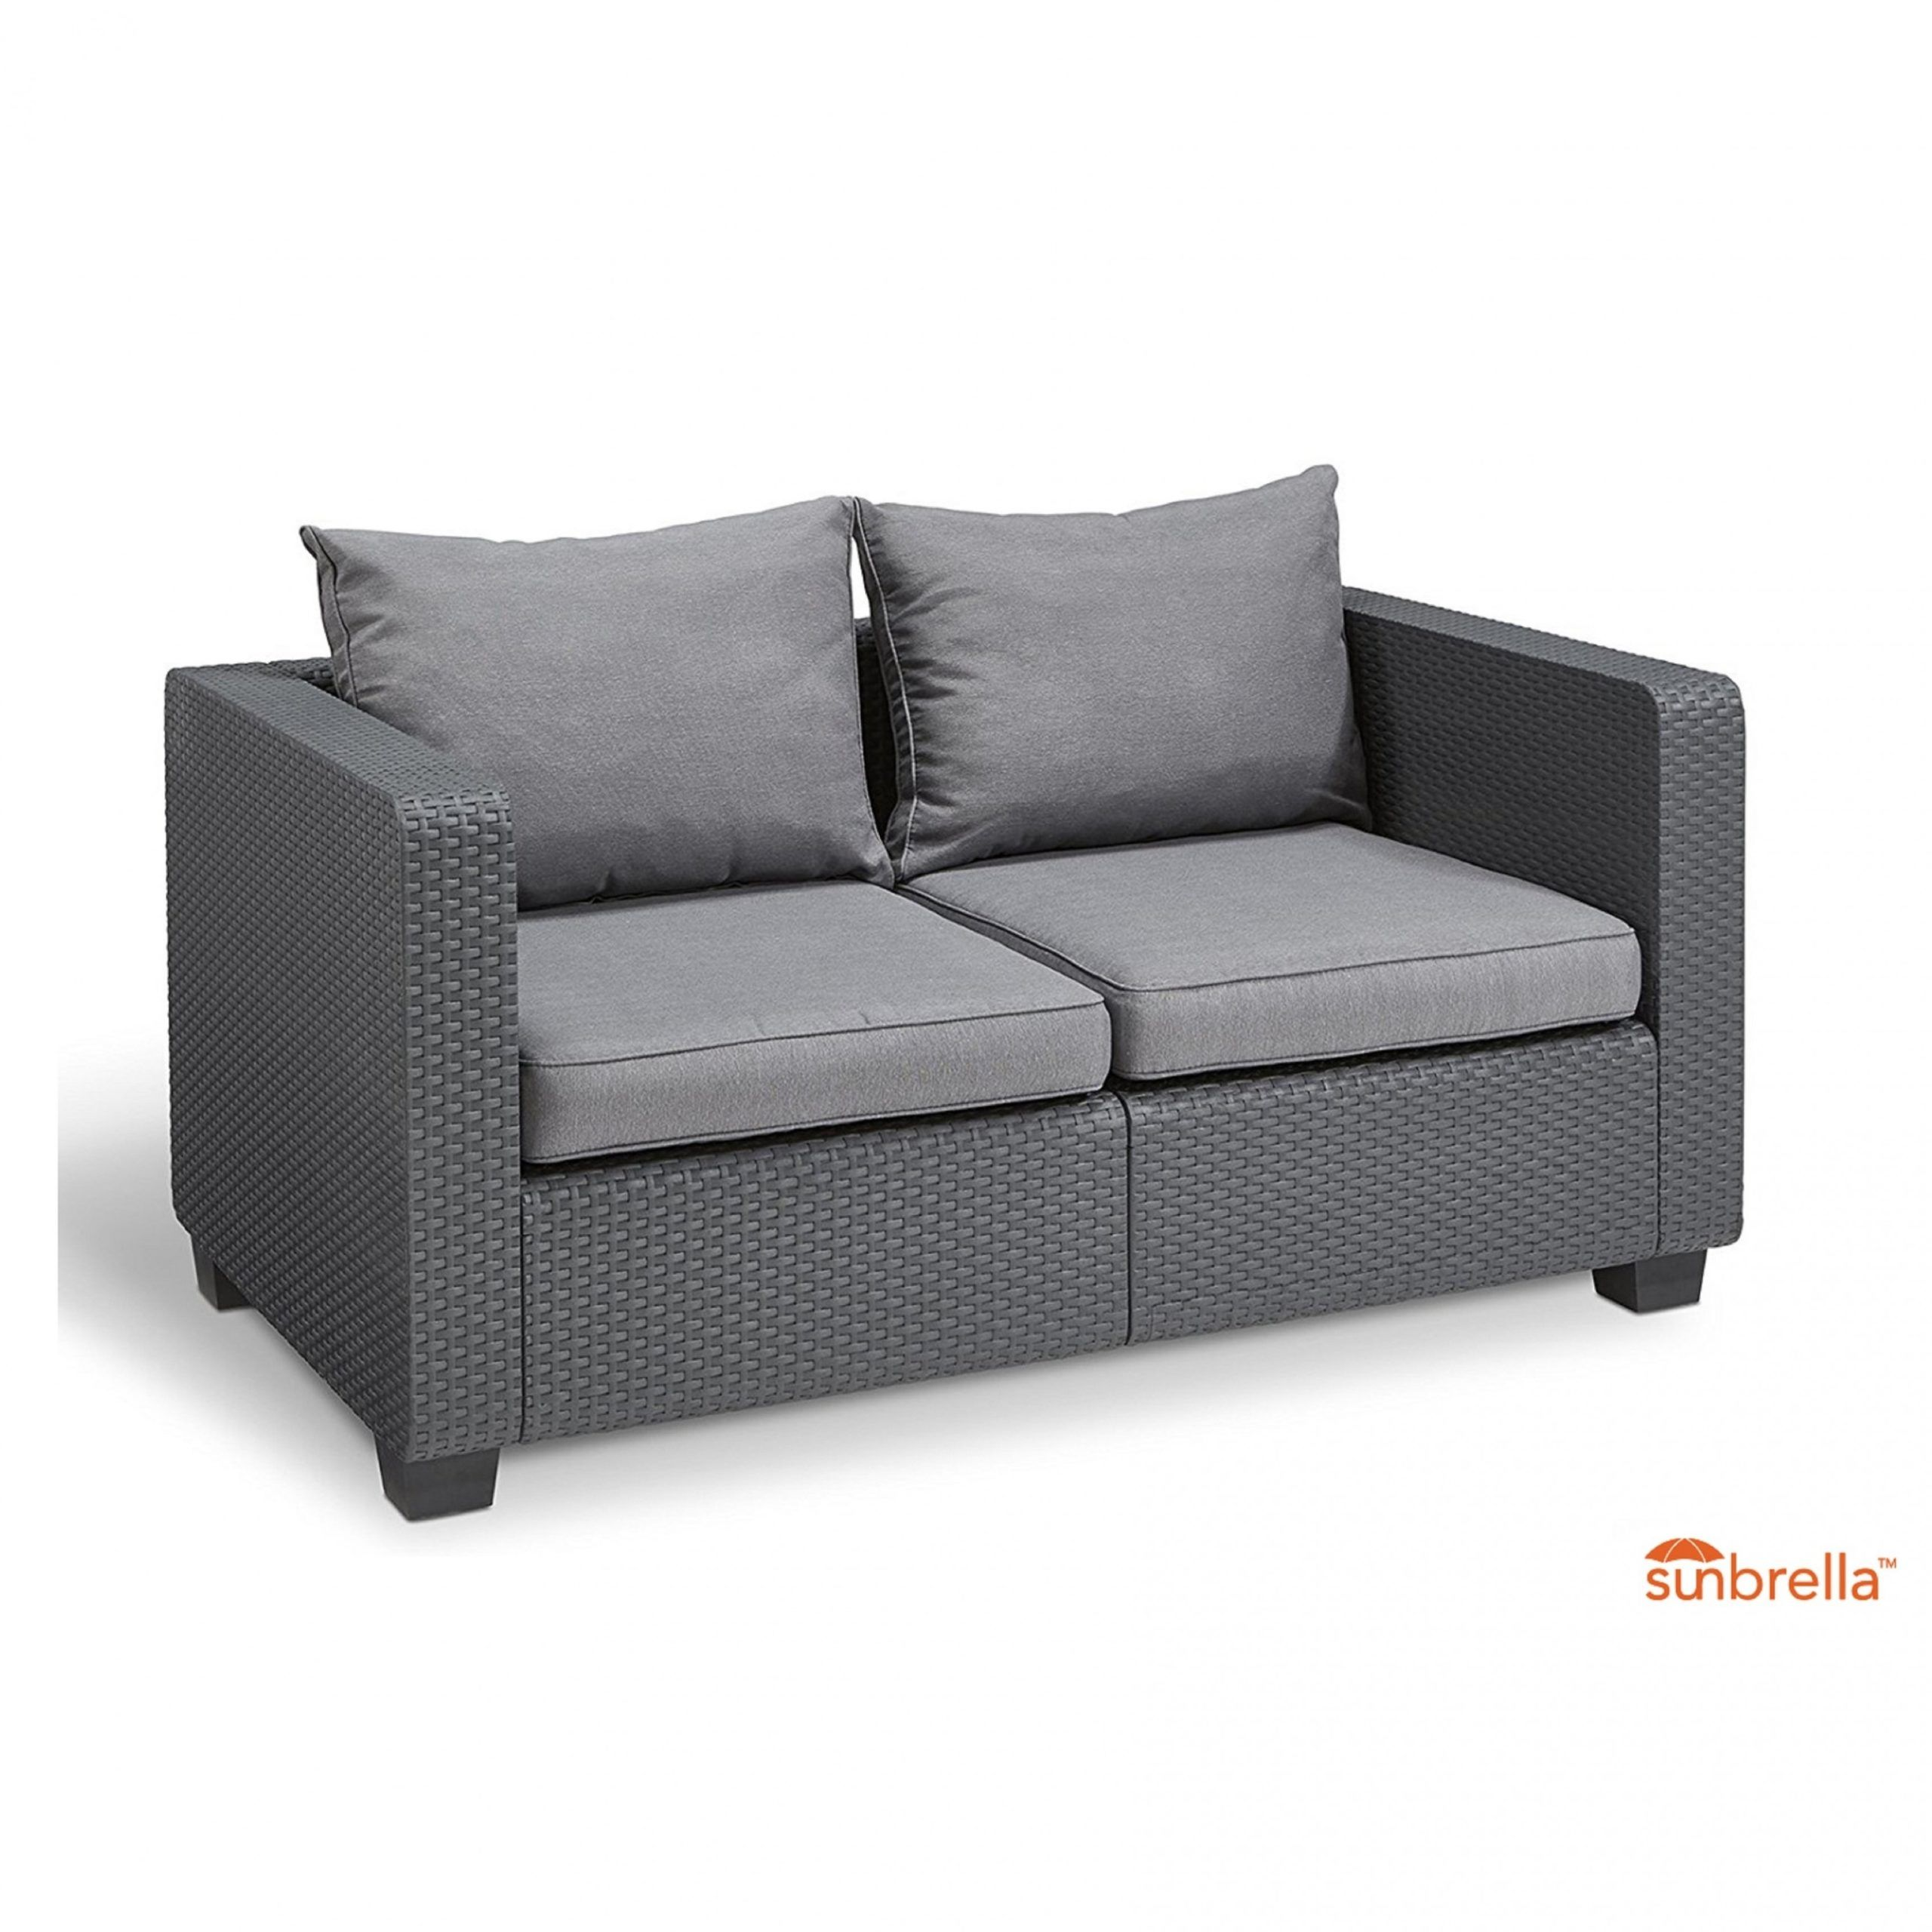 Keter Garden Sofa Set in 9  Furniture loveseat, Sunbrella